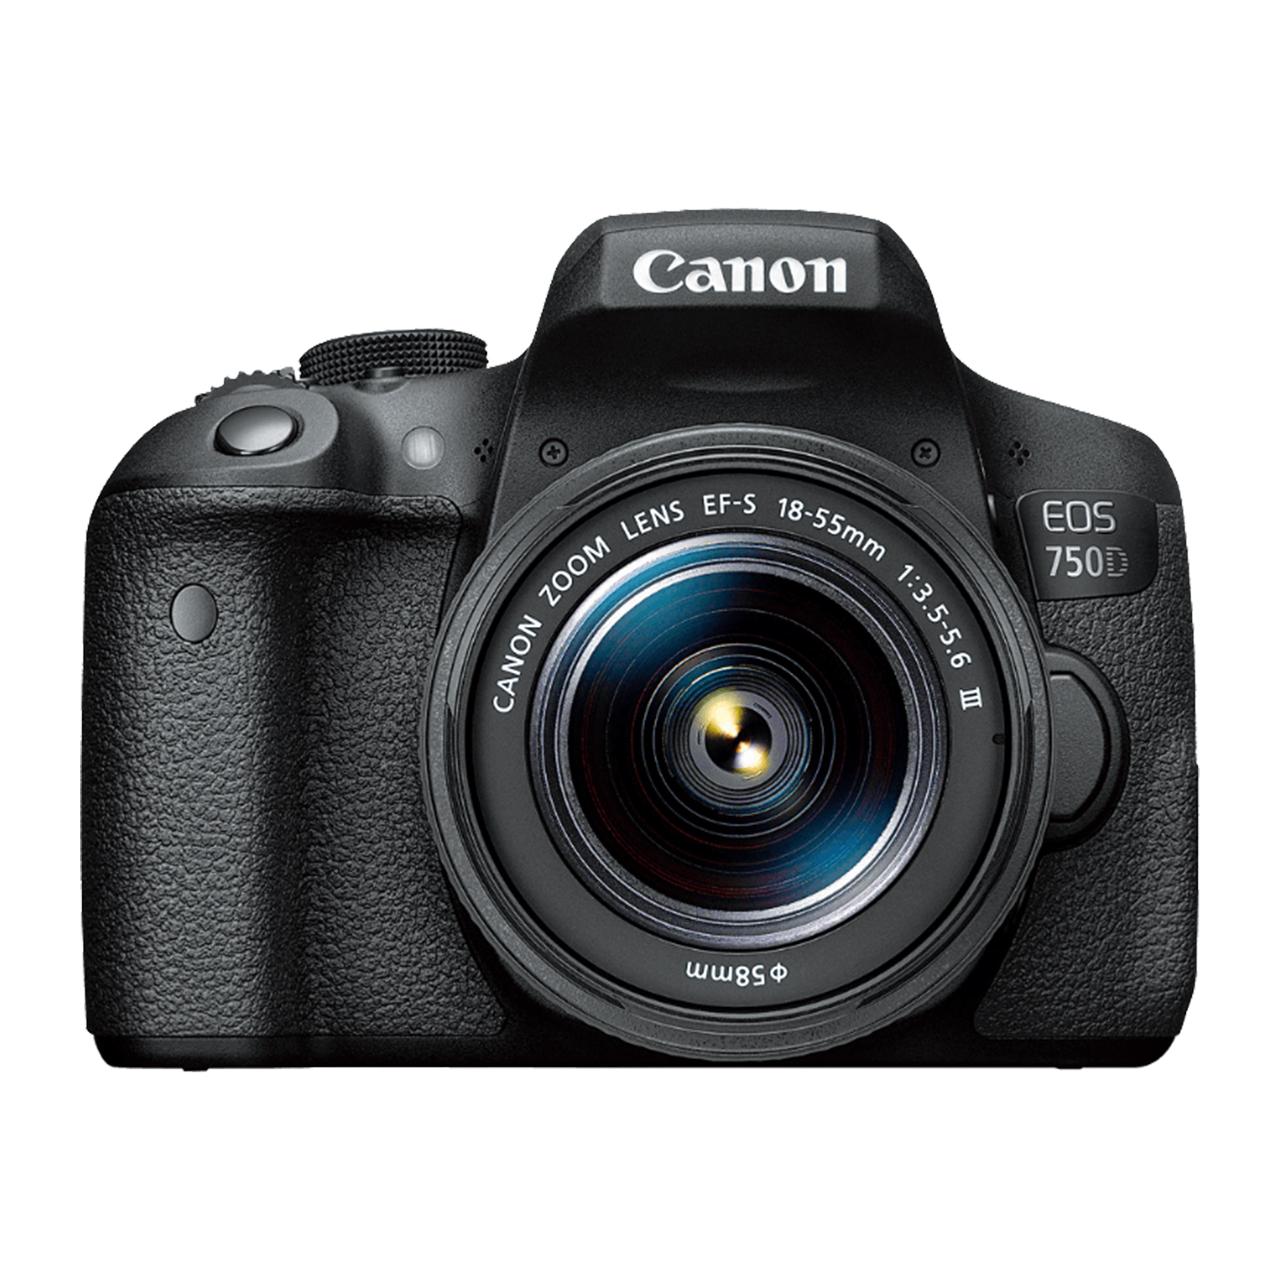 دوربین دیجیتال کانن مدل EOS 750D به همراه لنز 18-55 میلی متر DC III